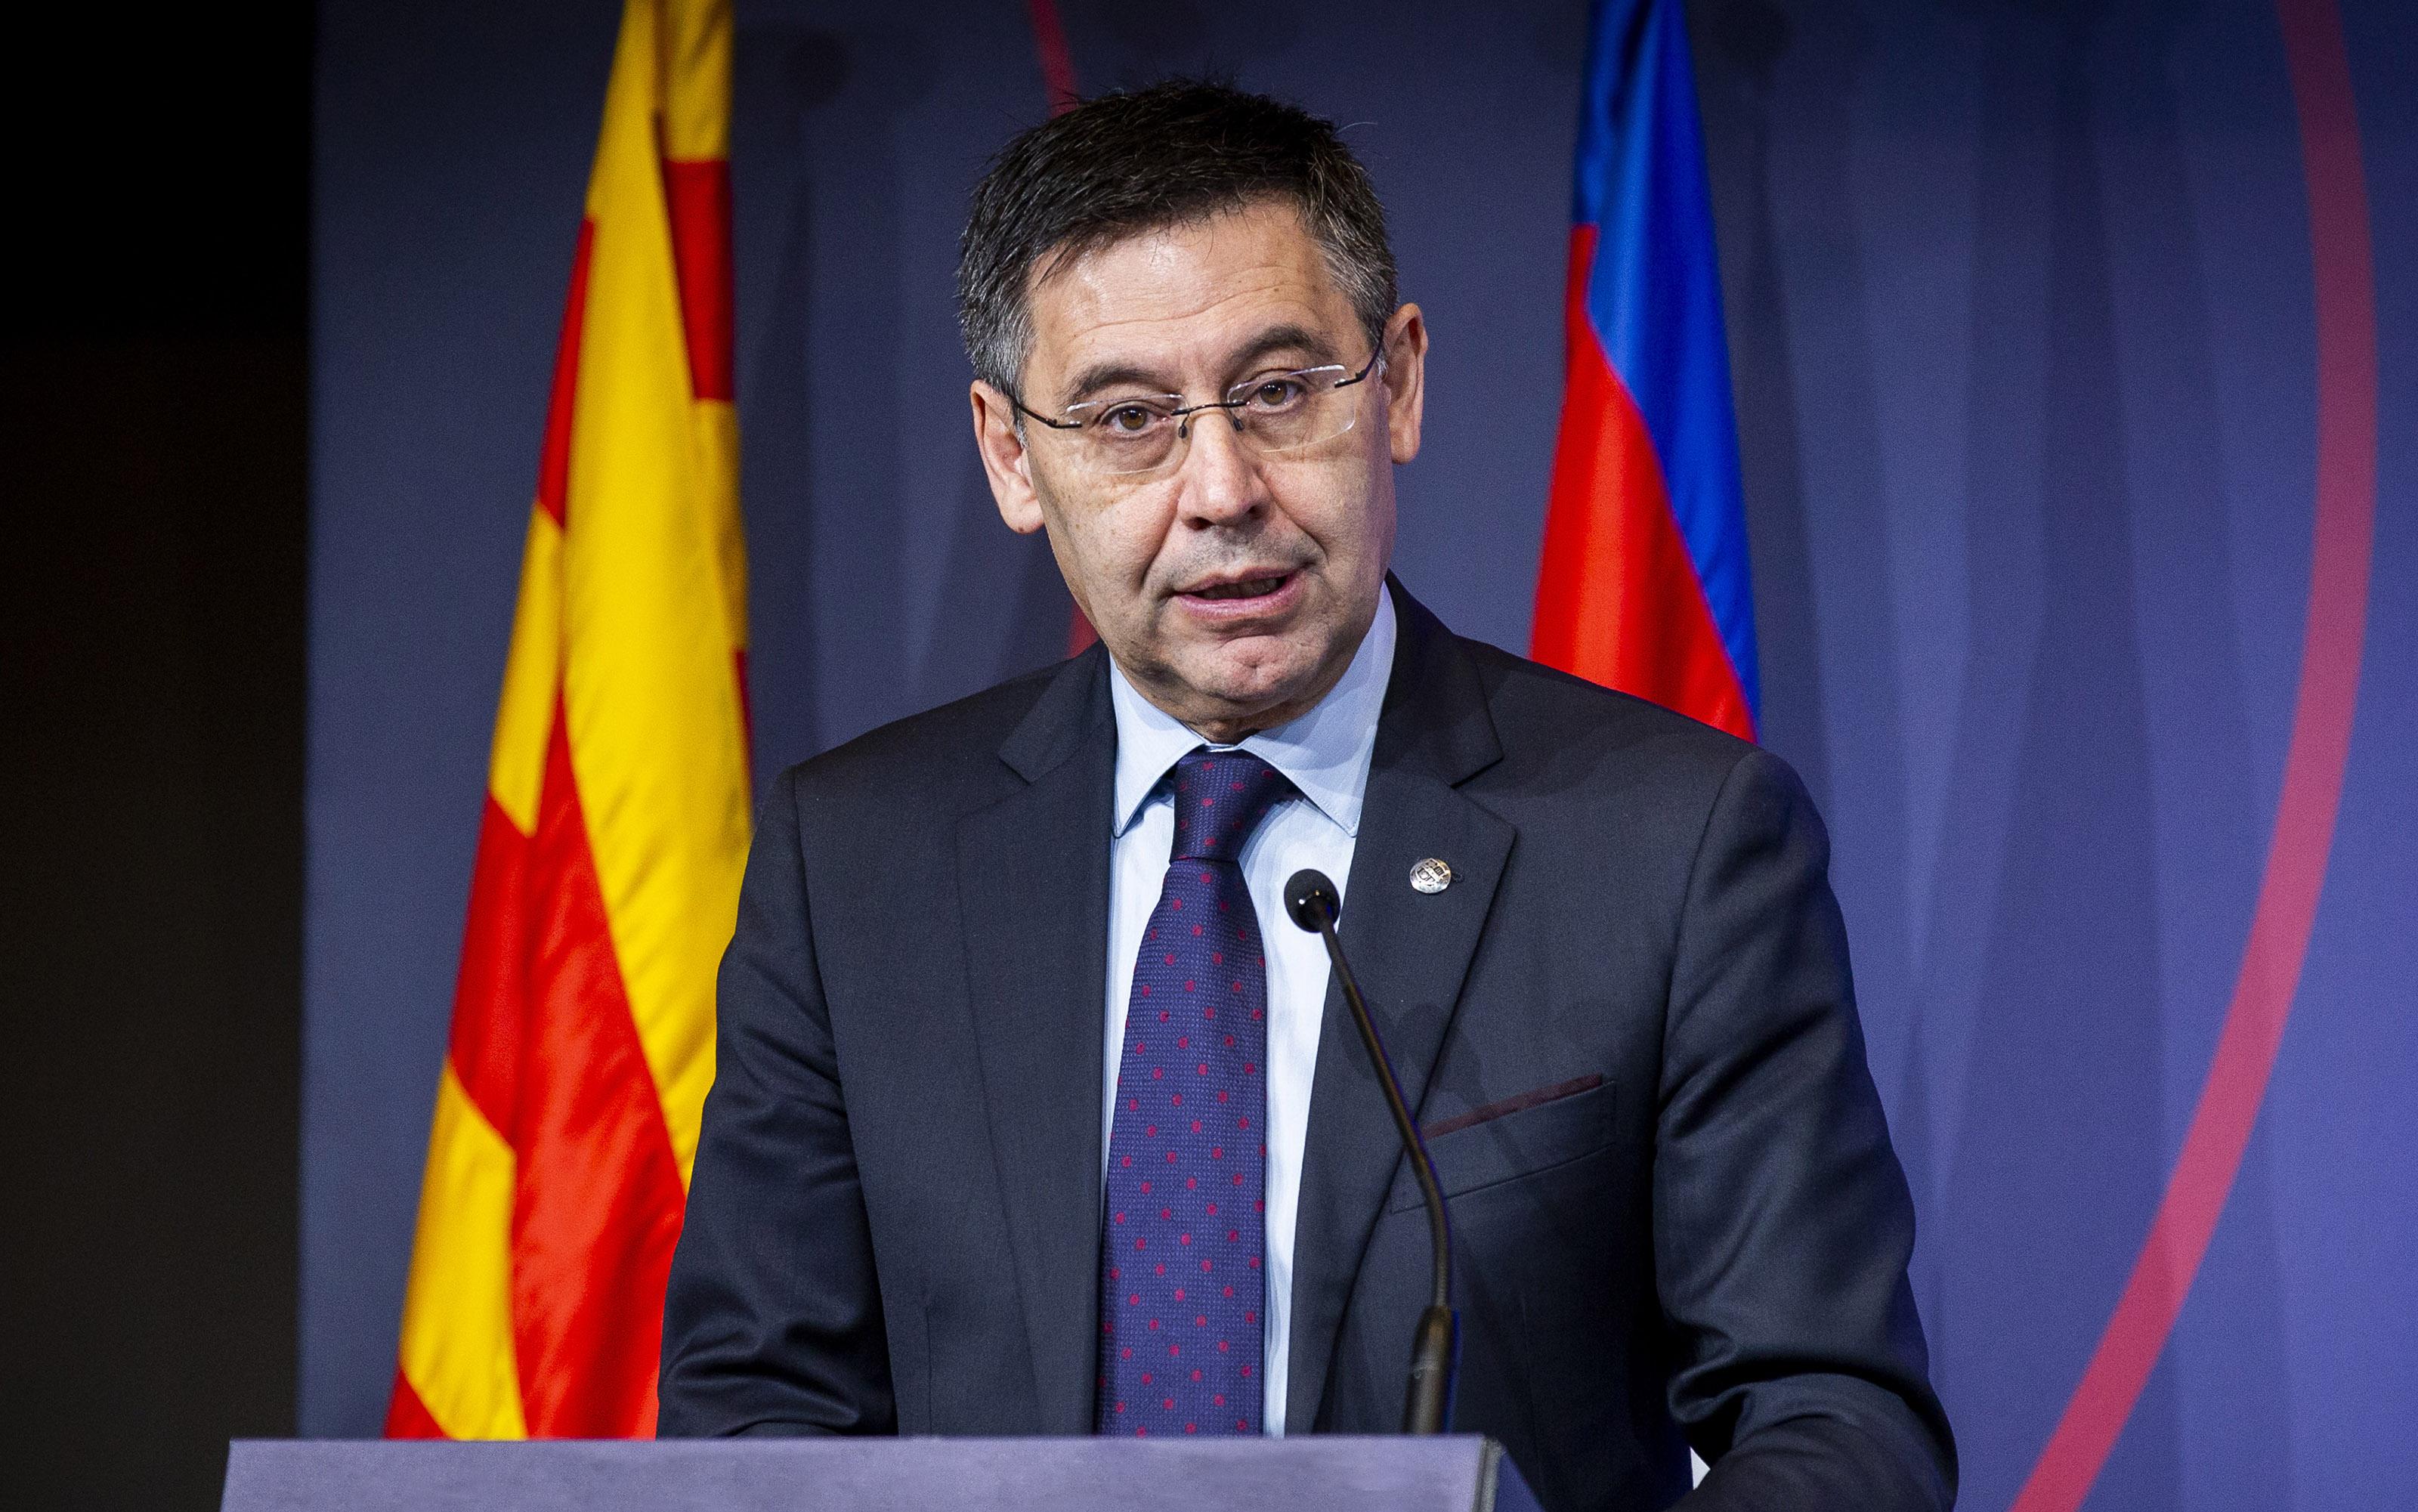 احتمال استعفای جوزپ ماریا بارتومئو